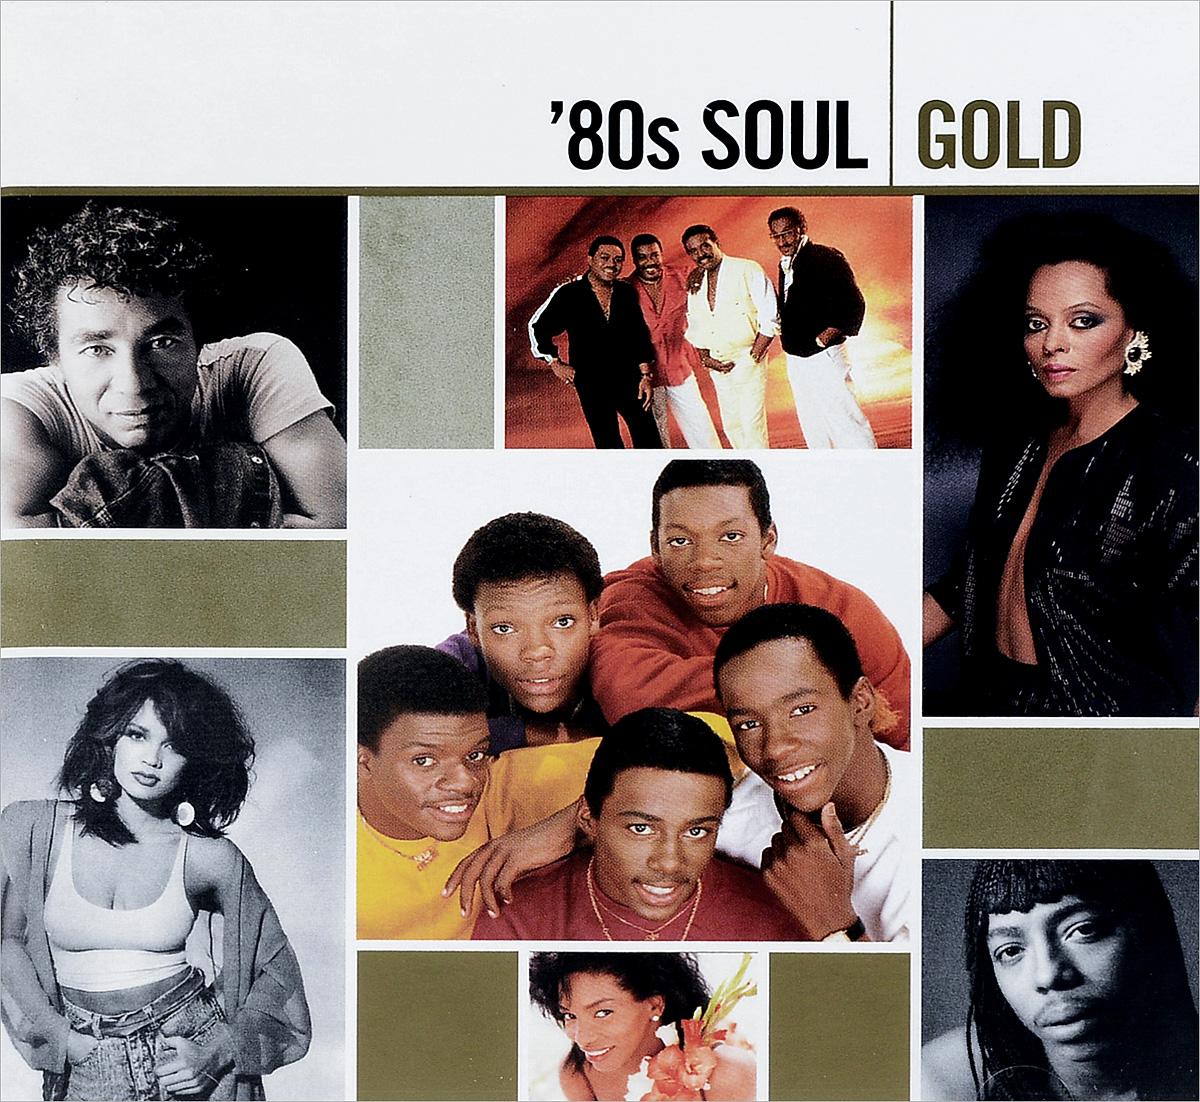 80s Soul. Gold (2 CD)